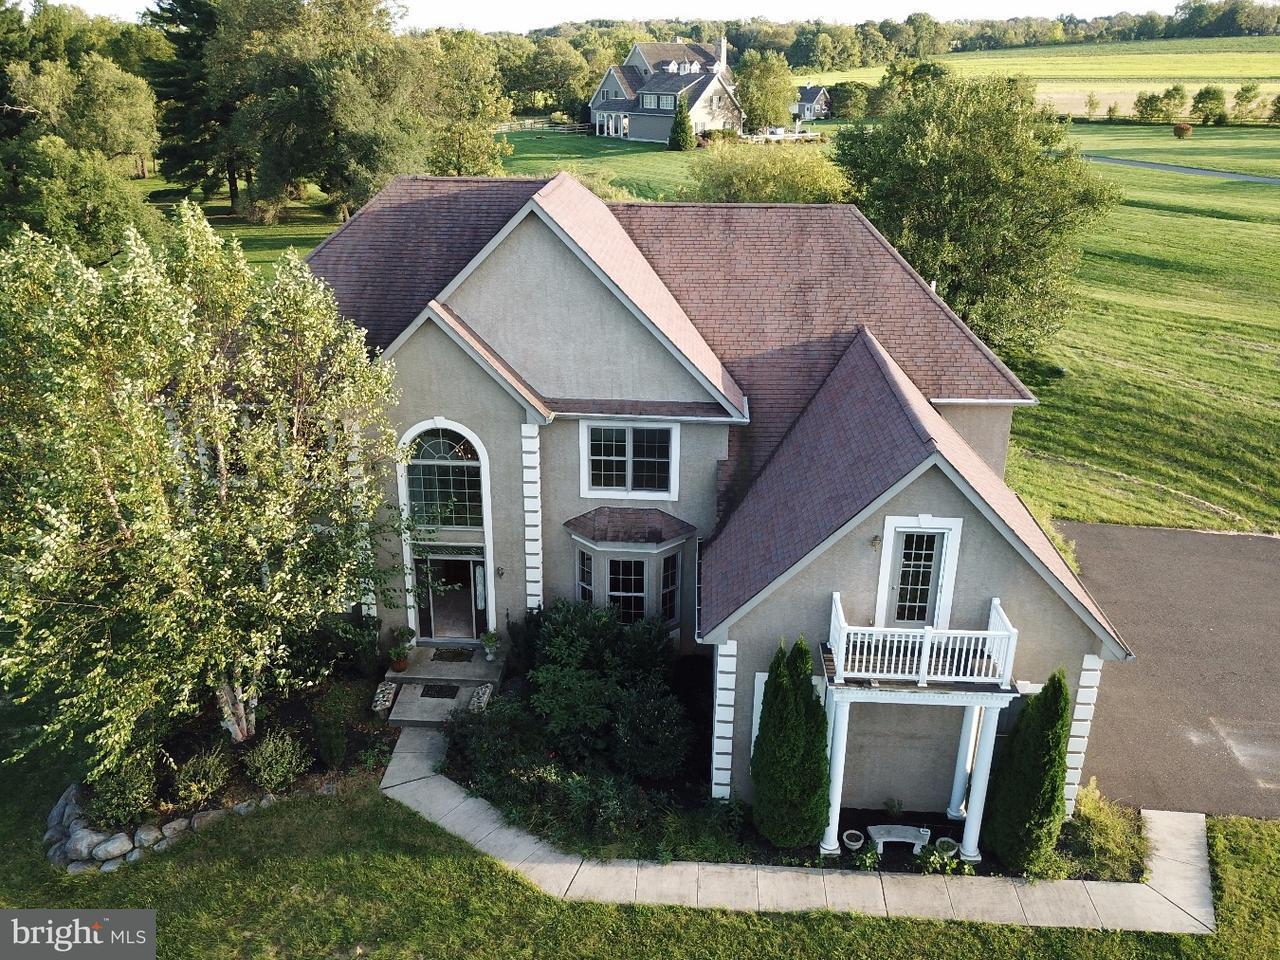 獨棟家庭住宅 為 出售 在 3145 RUSHLAND Road Jamison, 賓夕法尼亞州 18956 美國